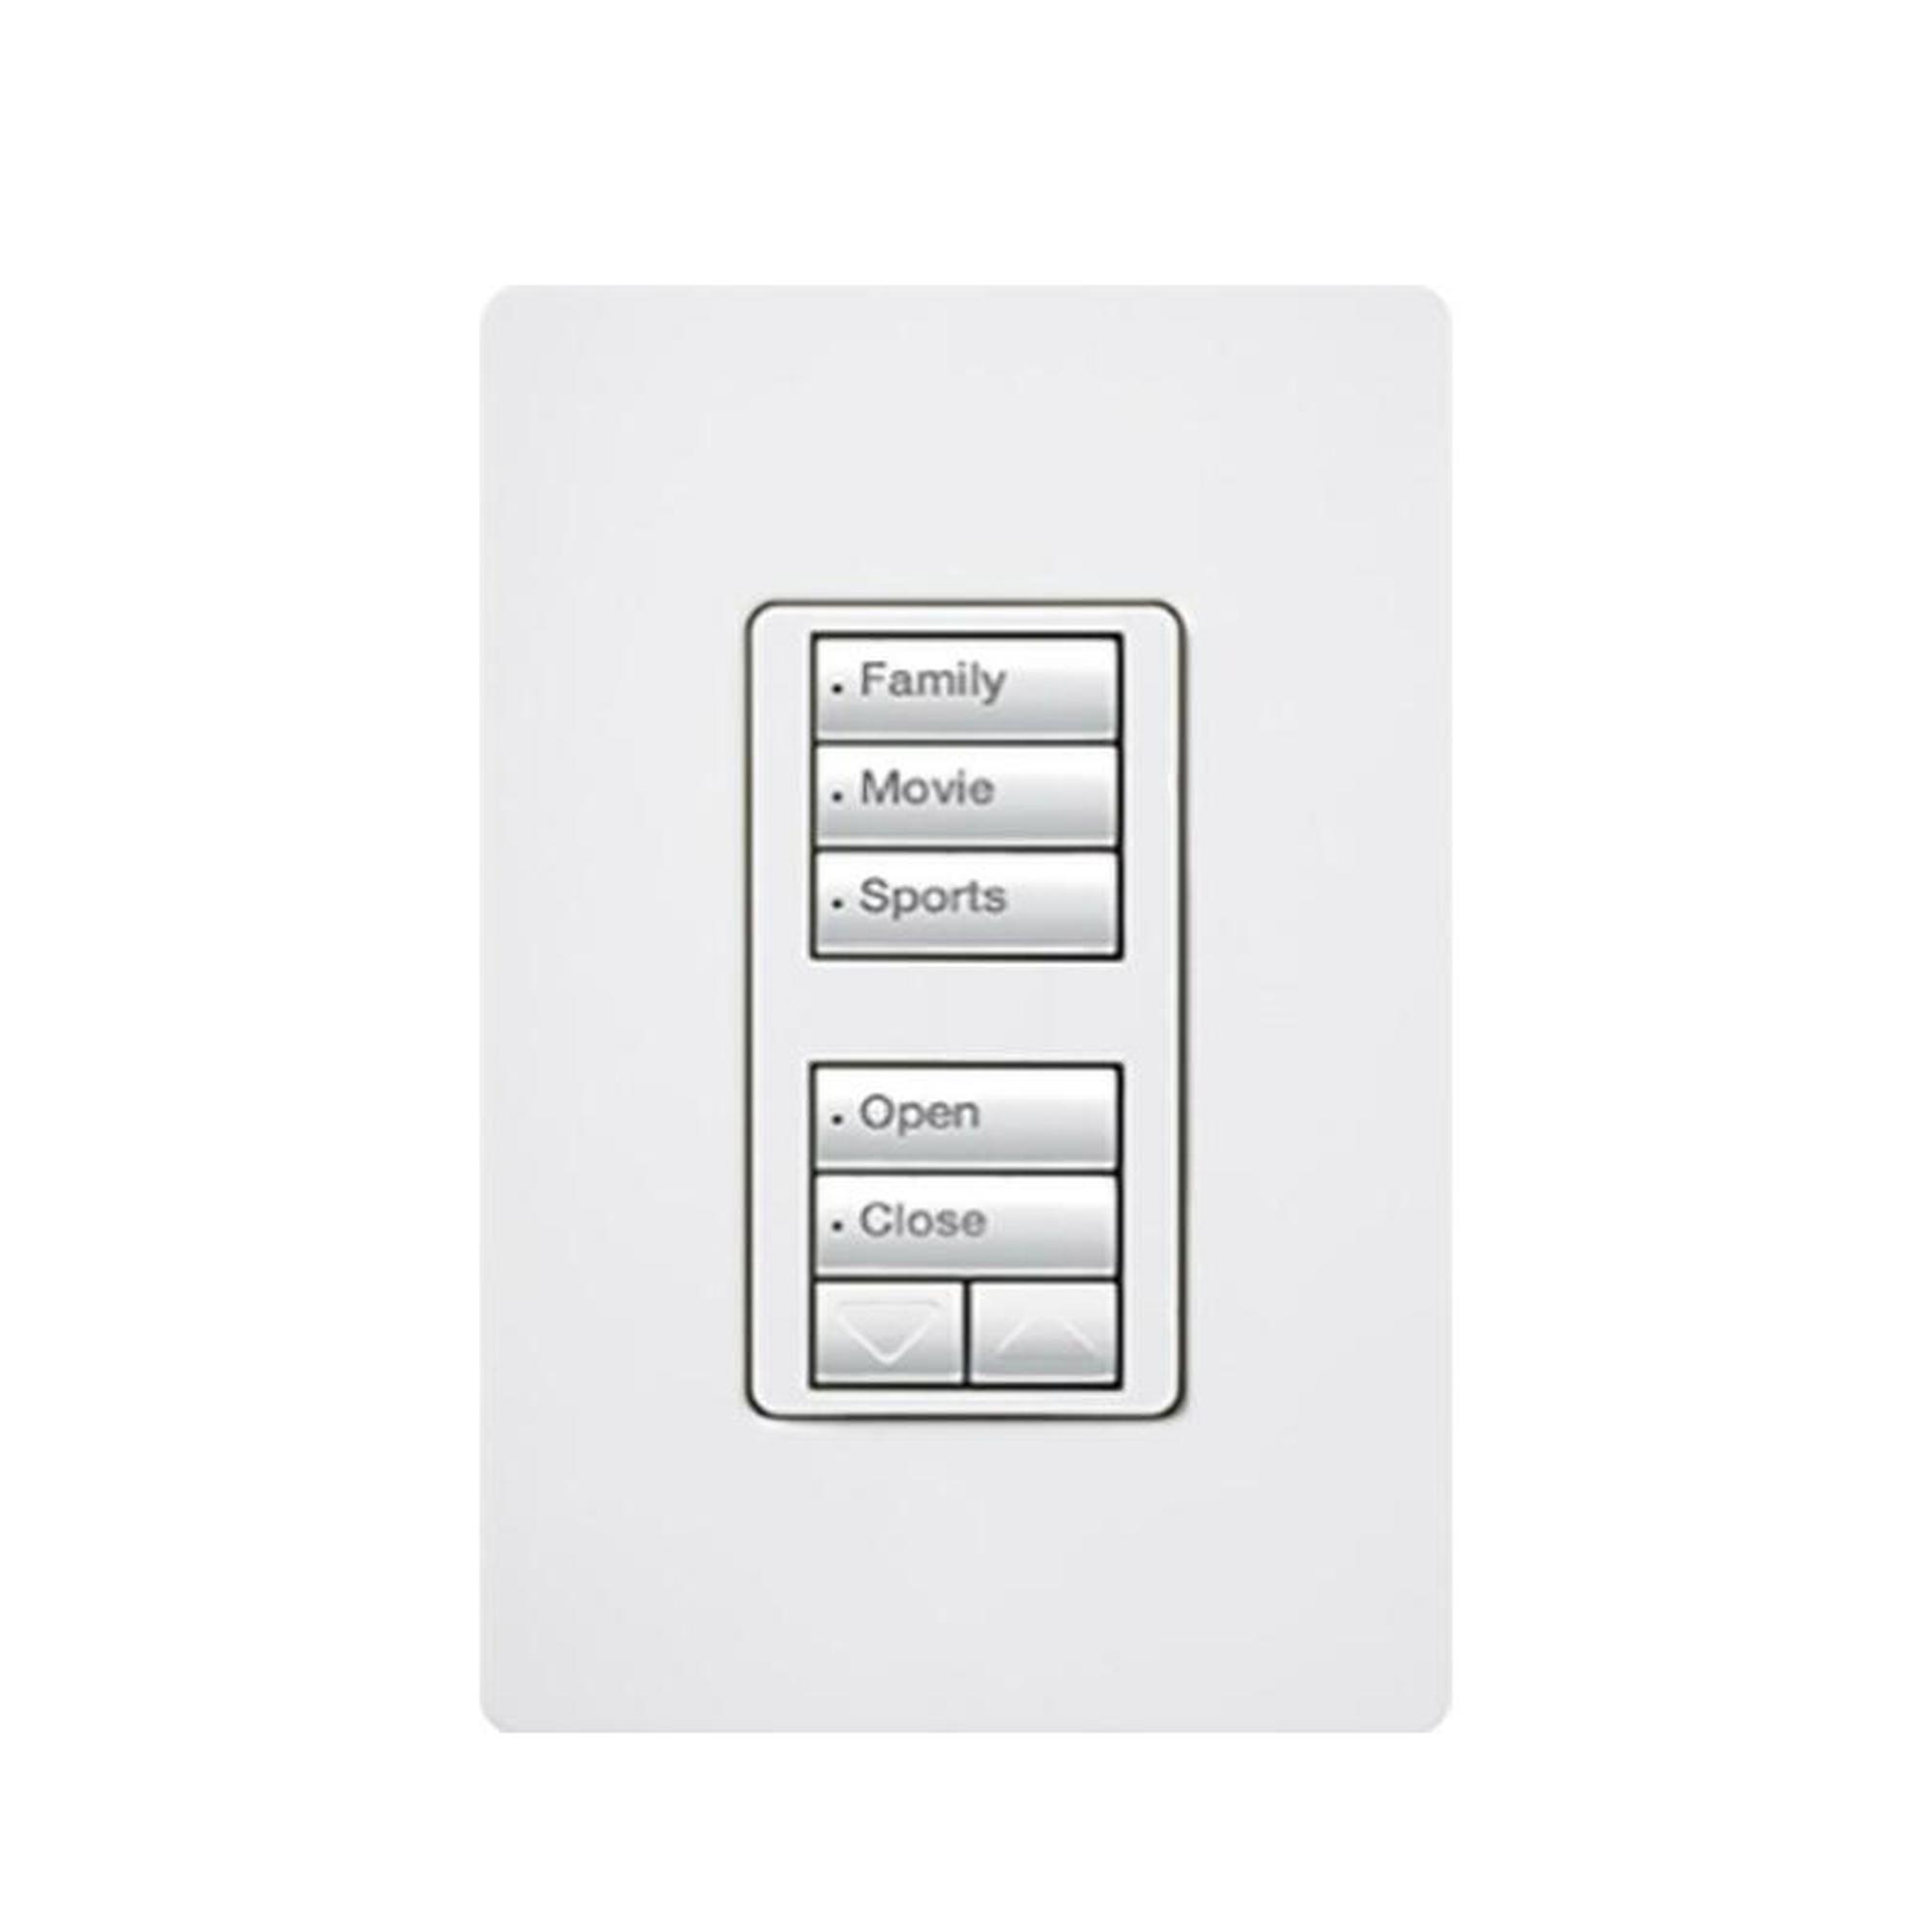 Teclado seetouch 5 botones, 2 botones subir/bajar, programe escenas diferentes en cada botón.